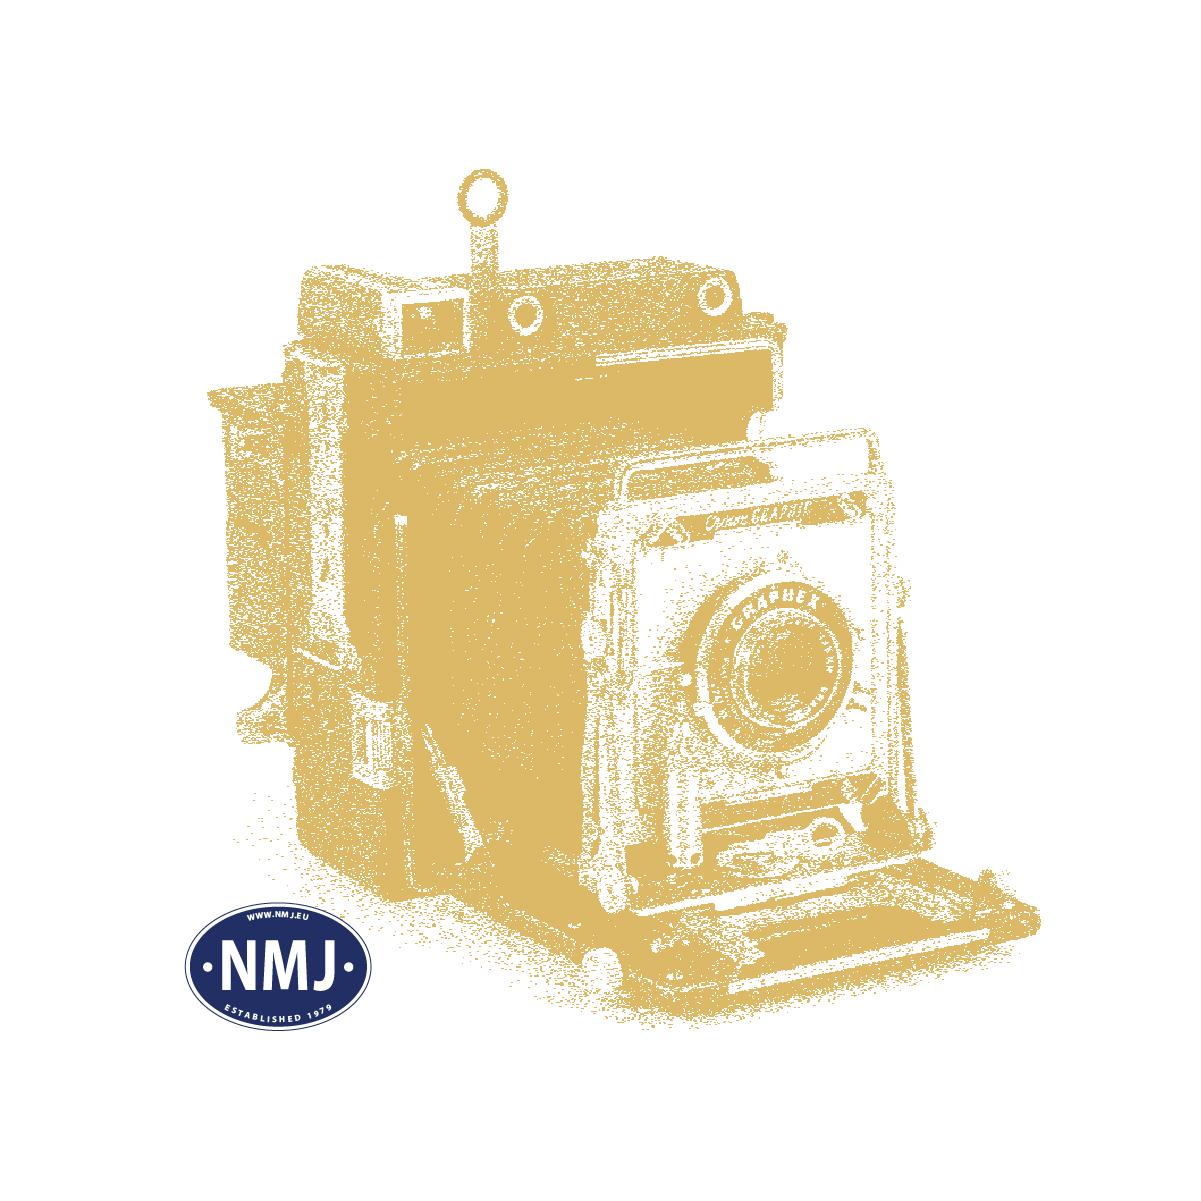 MBR51-2107 - Italienische Pappel Sommer, 6-10cm, N